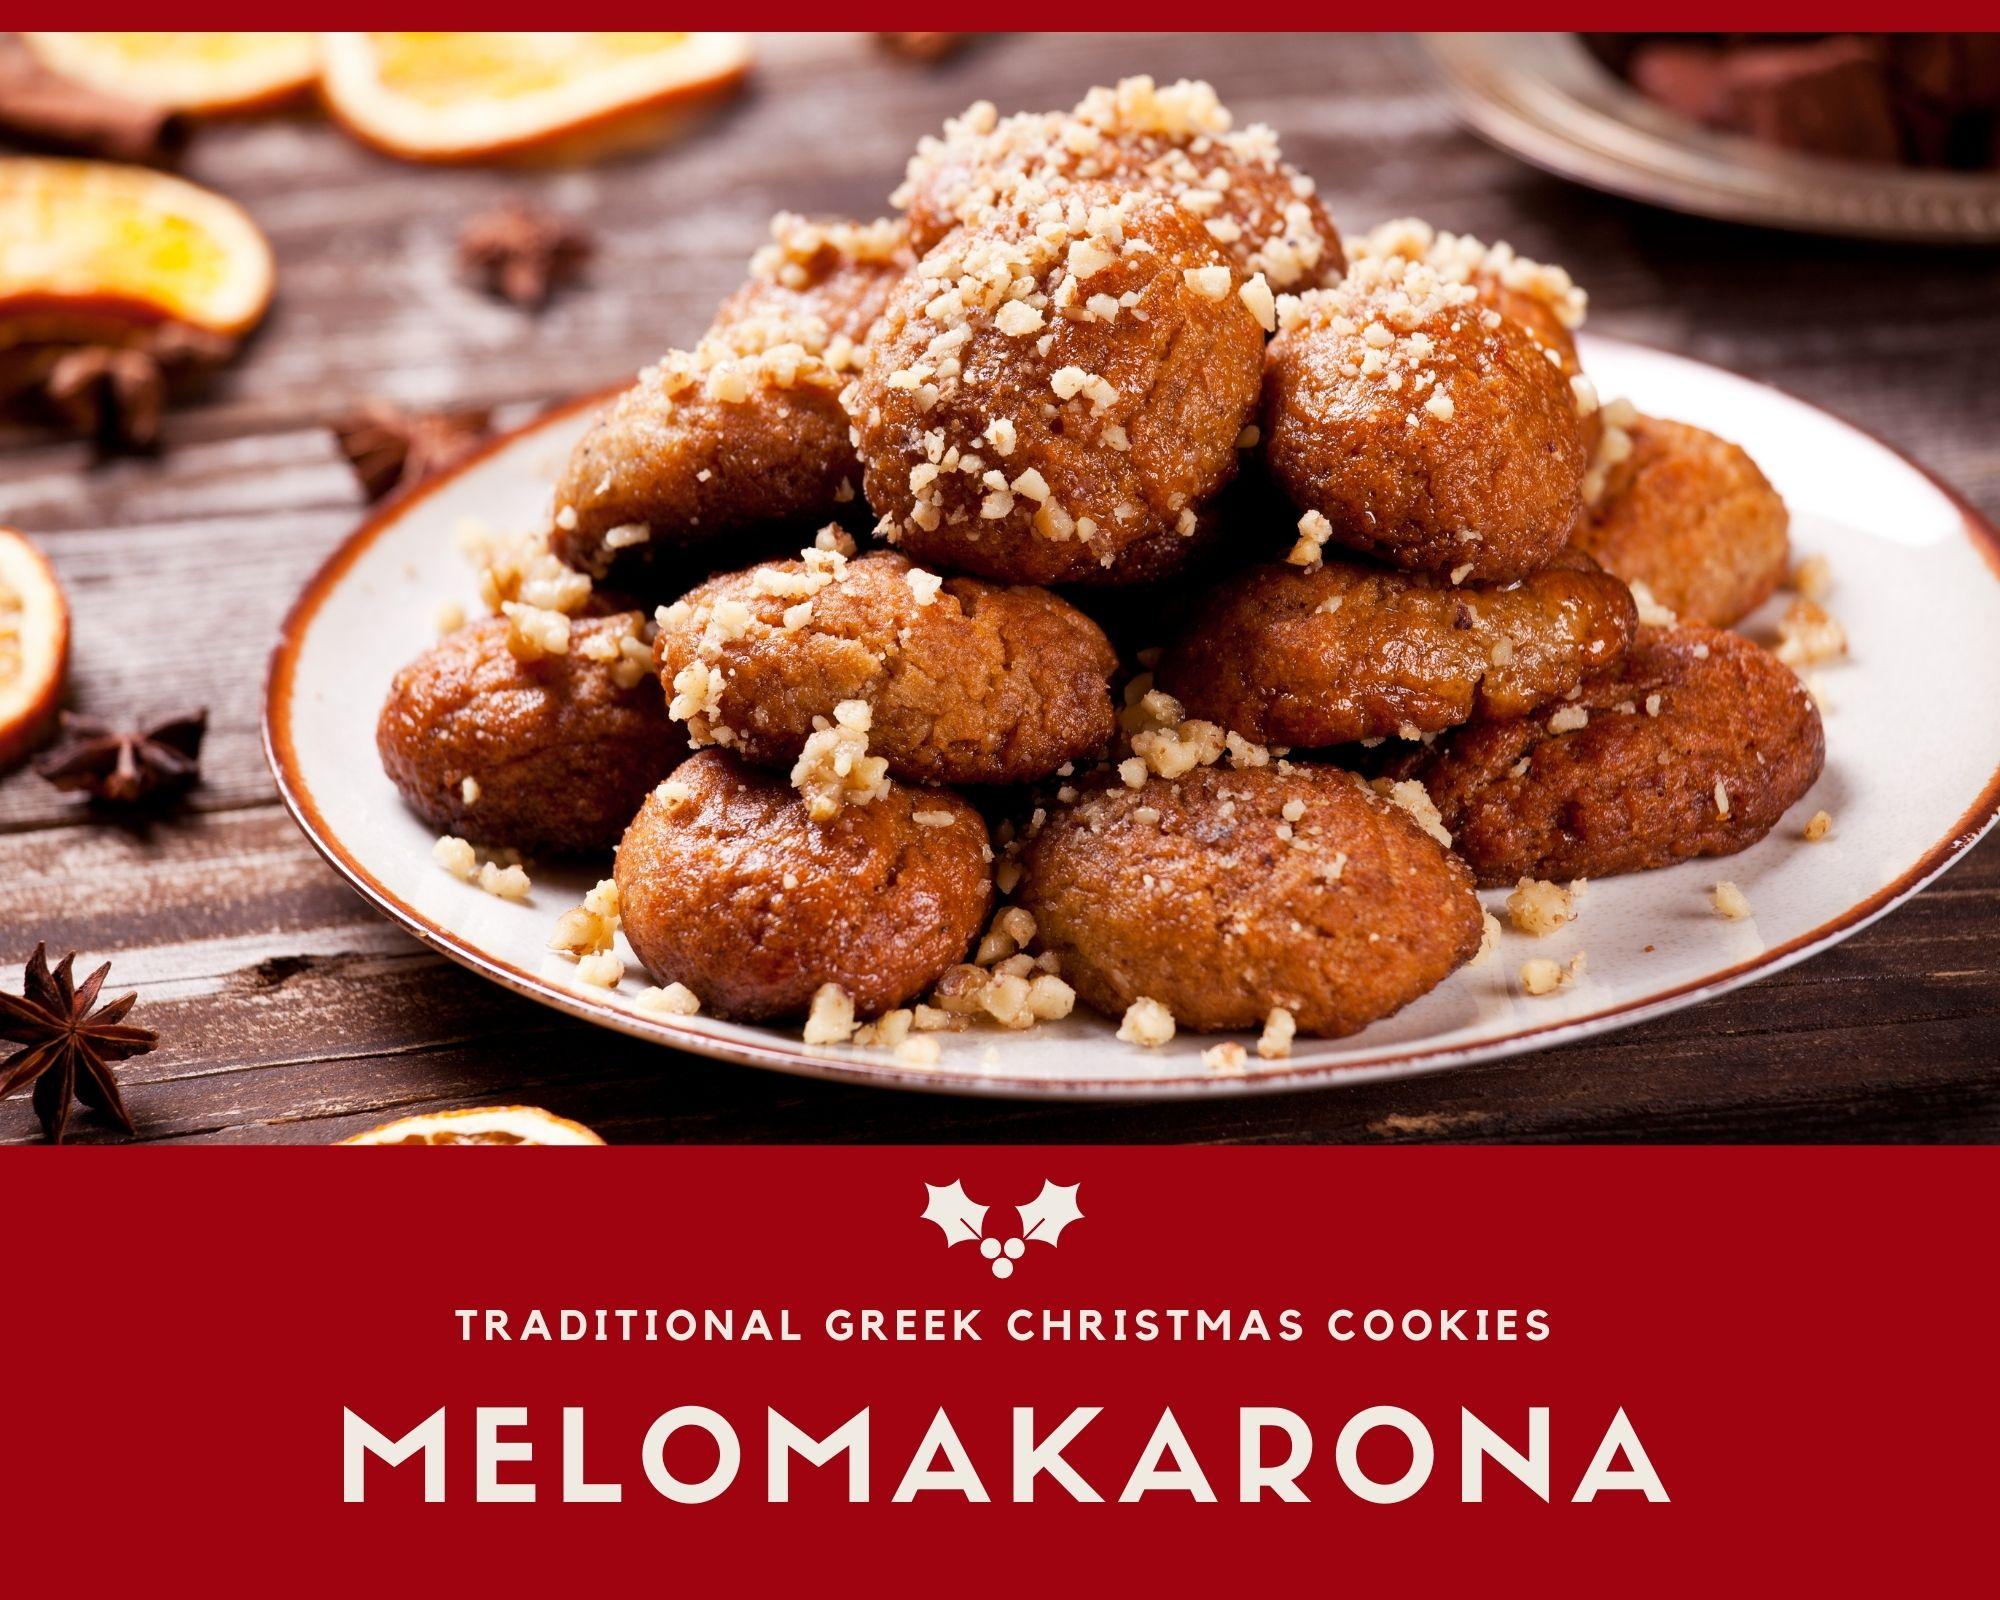 Mediterranean Recipes for winter - Greek sugar free sweets